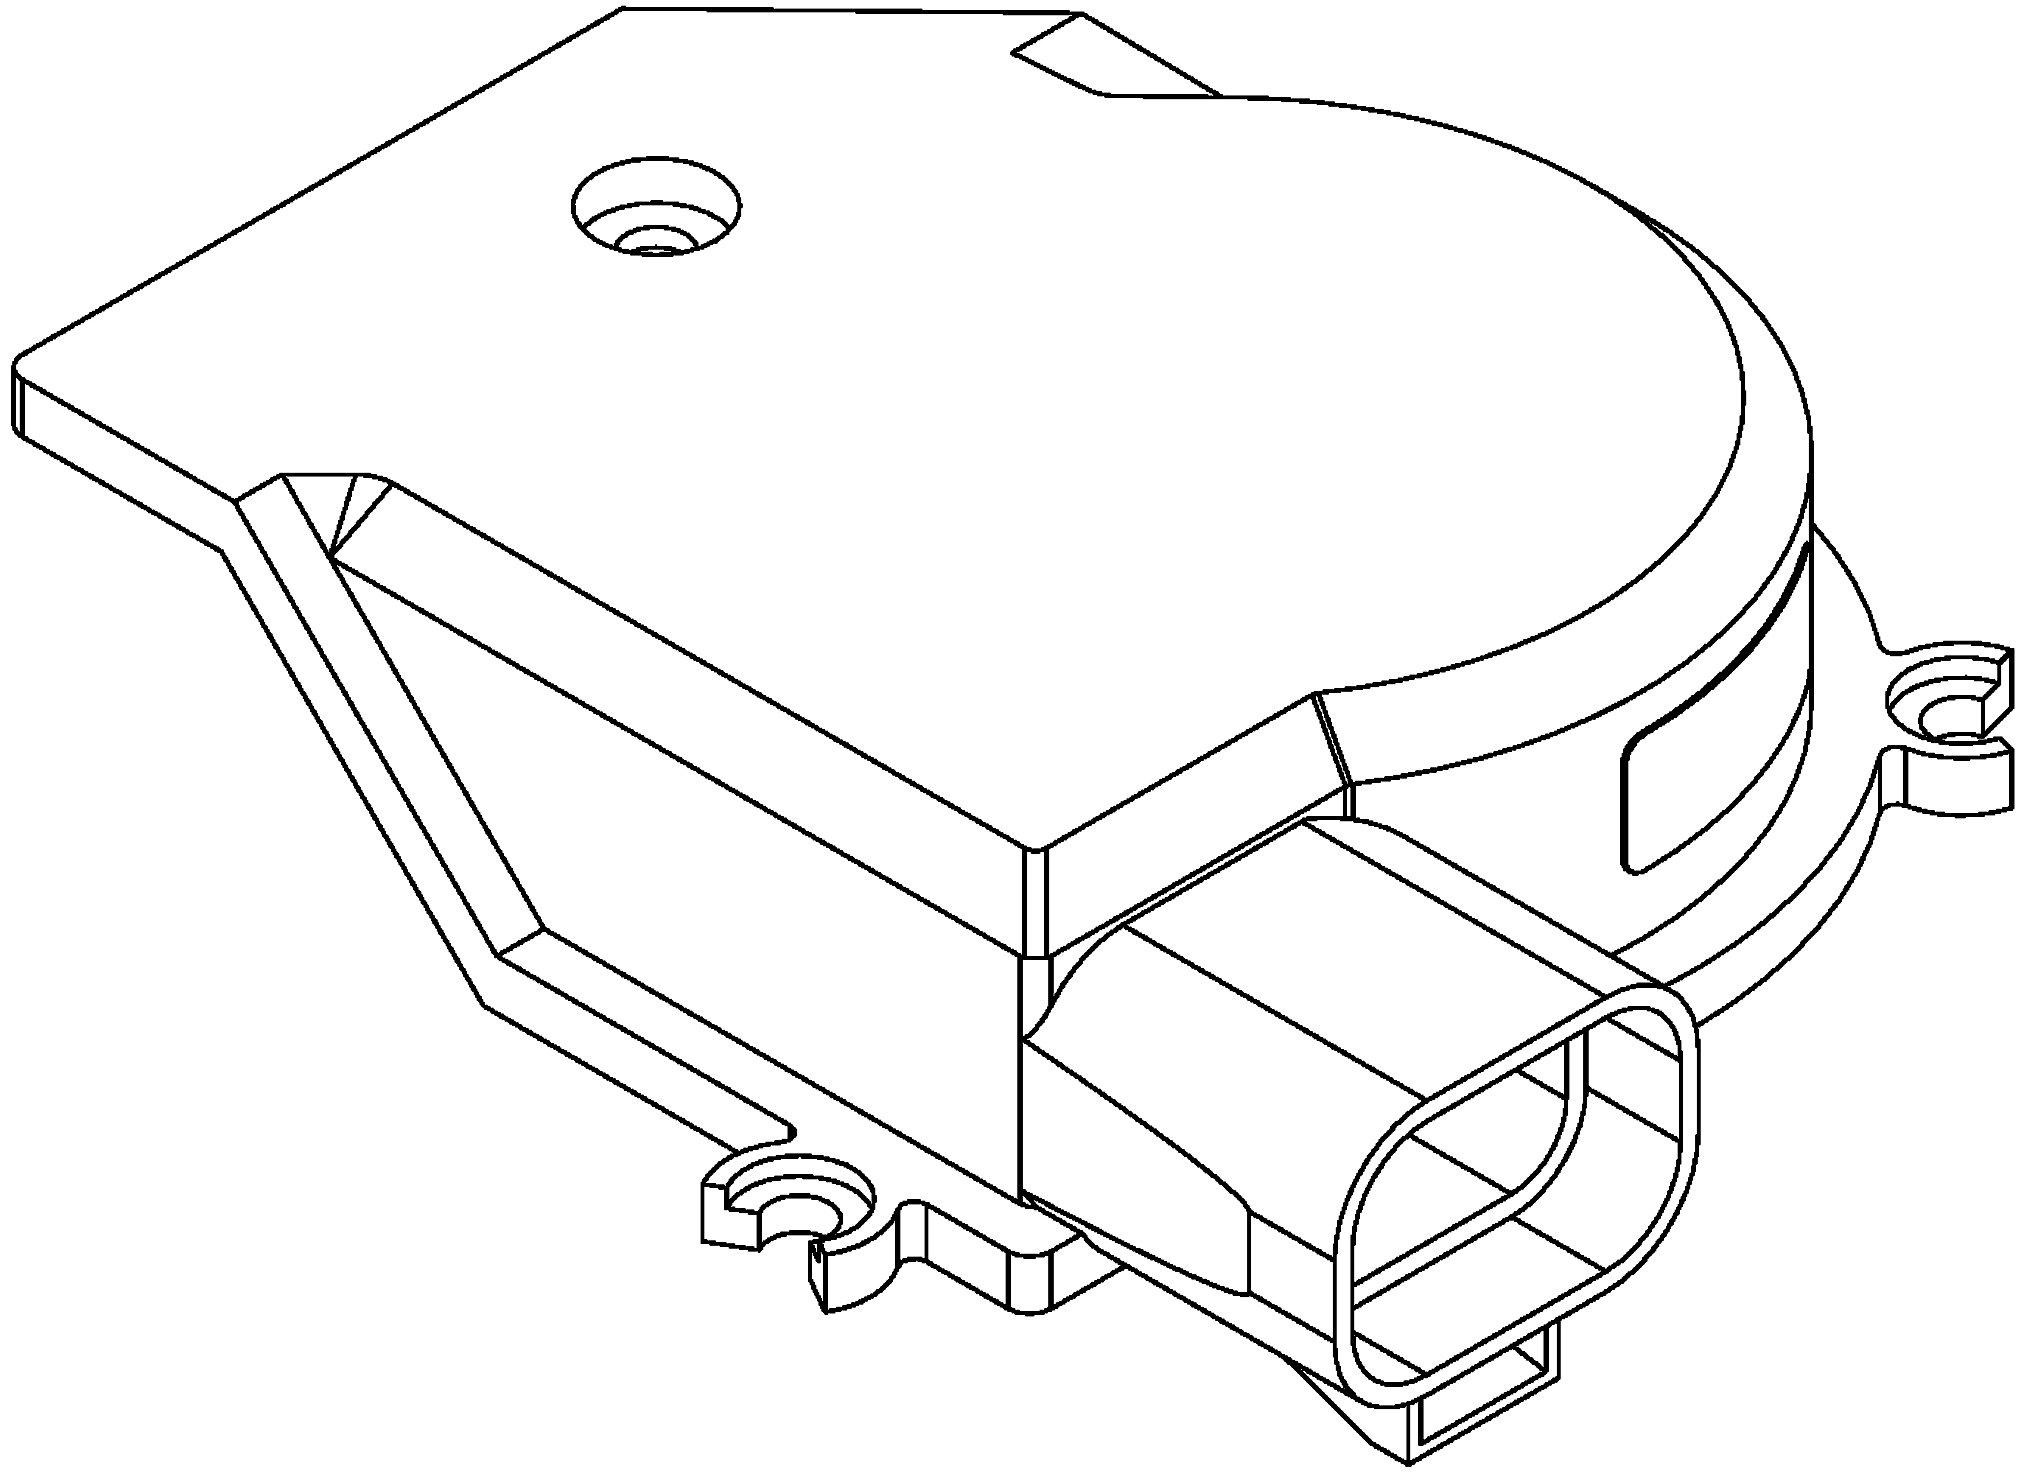 ACDelco 88958136 GM Original Equipment Windshield Wiper Motor Pulse Board And Cover